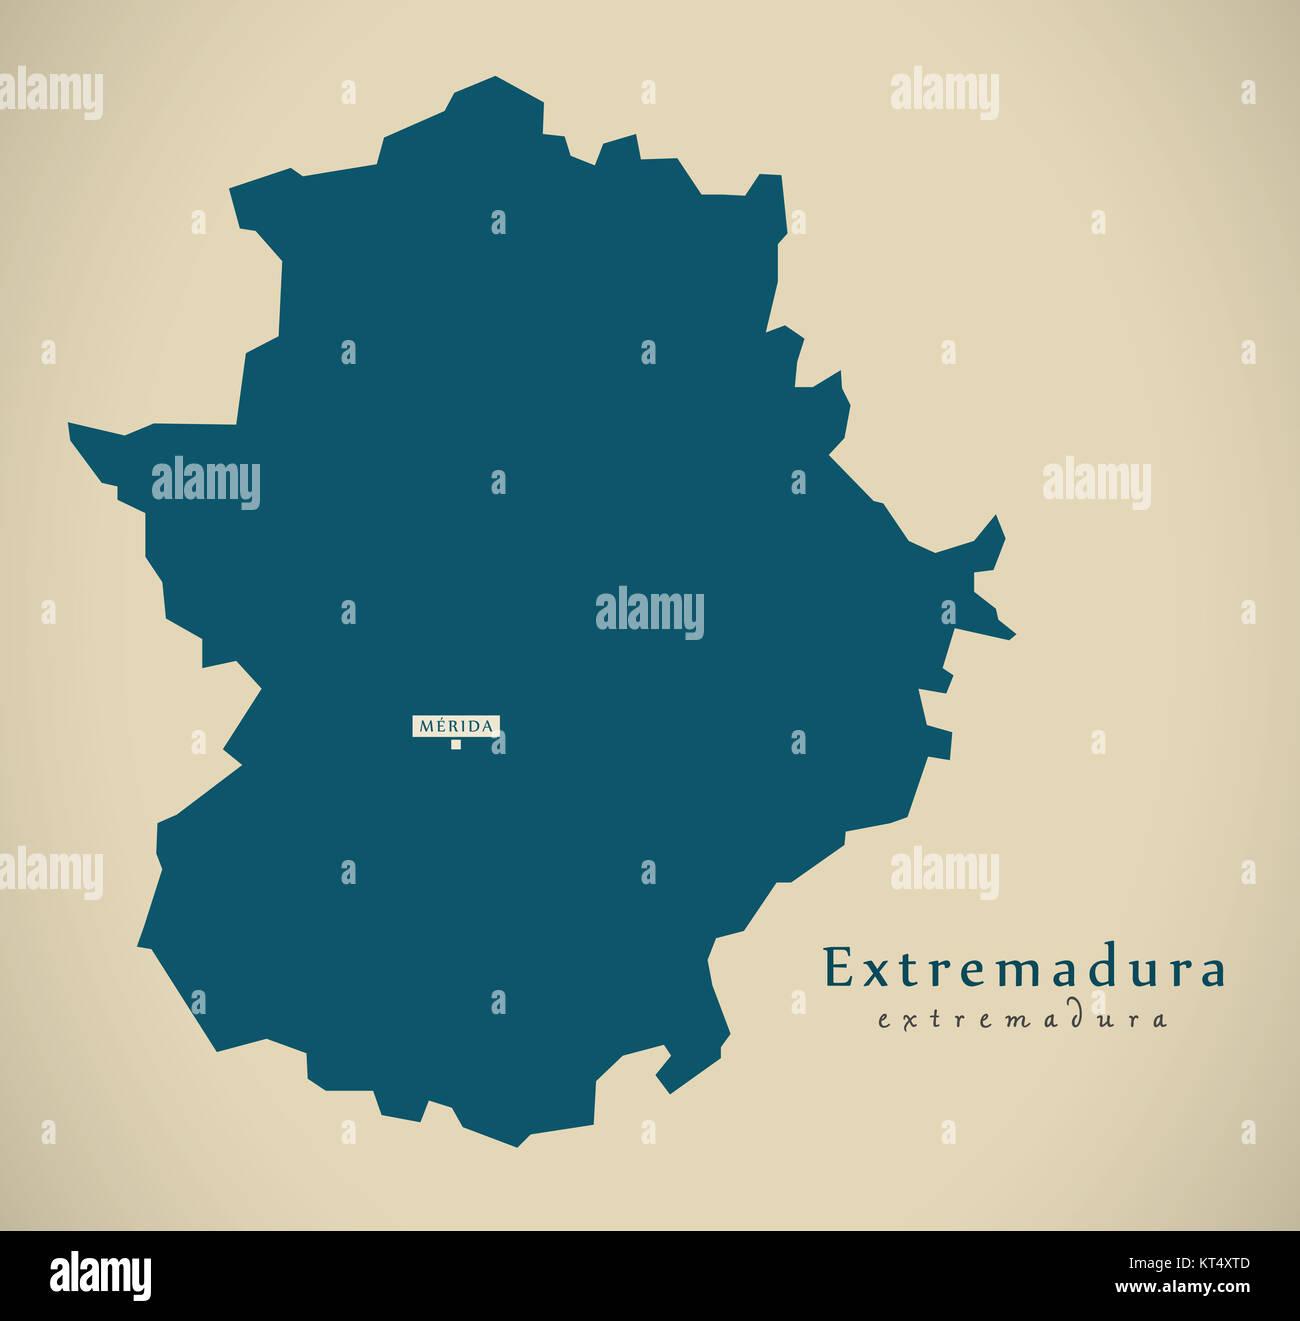 Modern Map Extremadura Spain Es Illustration Stock Photo